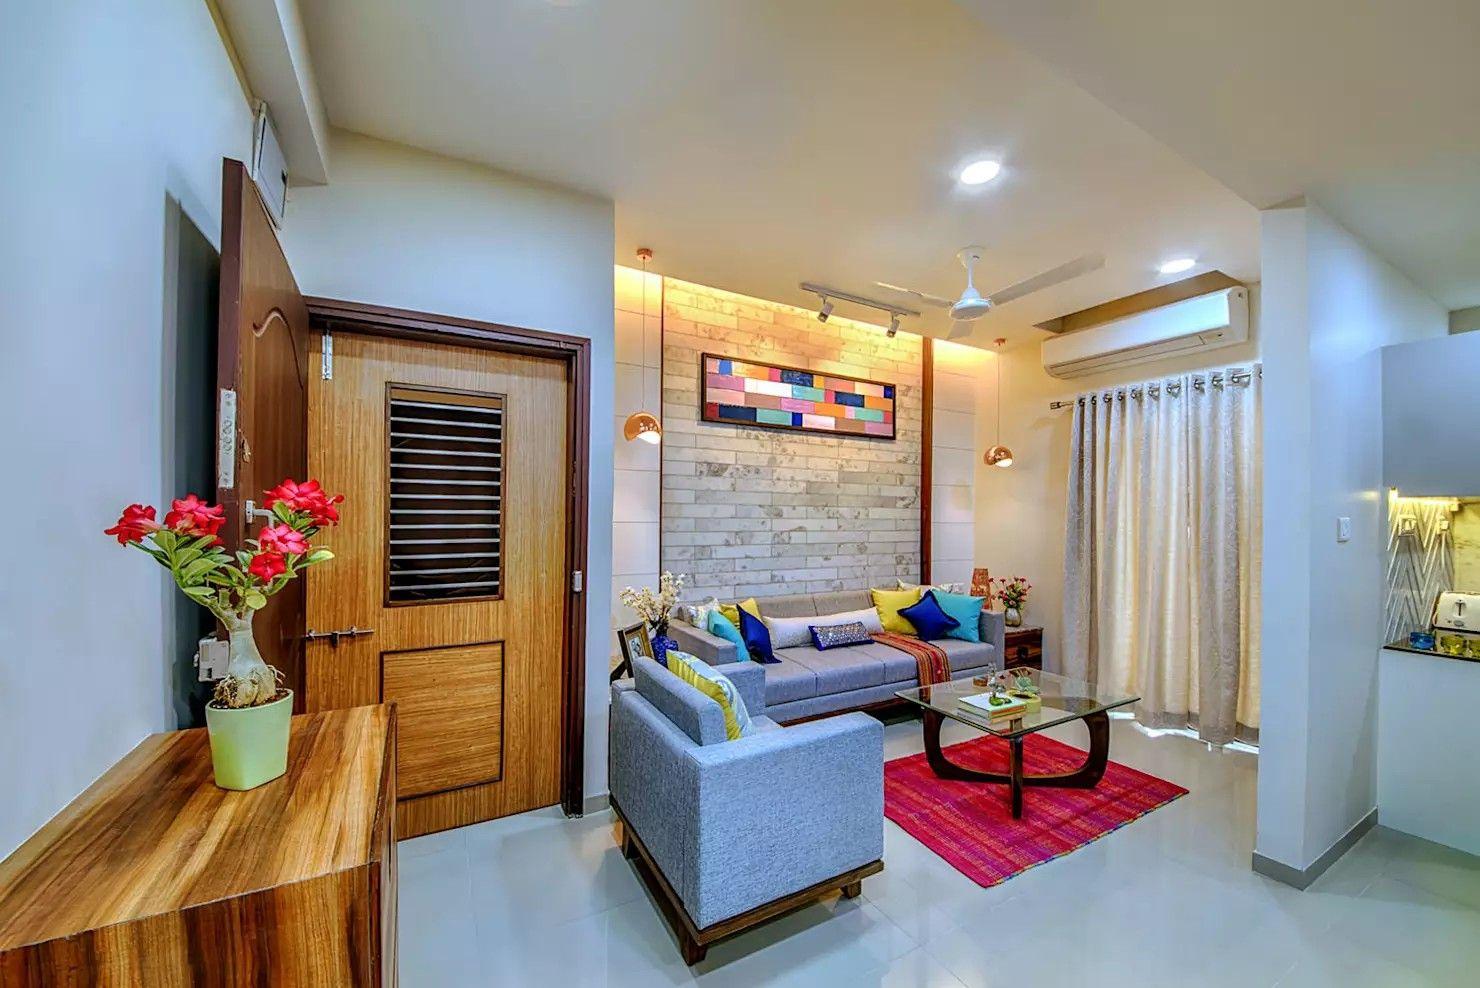 Como Encontrar El Amor Segun El Feng Shui Pin By Riddhi Bali On Living Room Accents Eclectic Interior